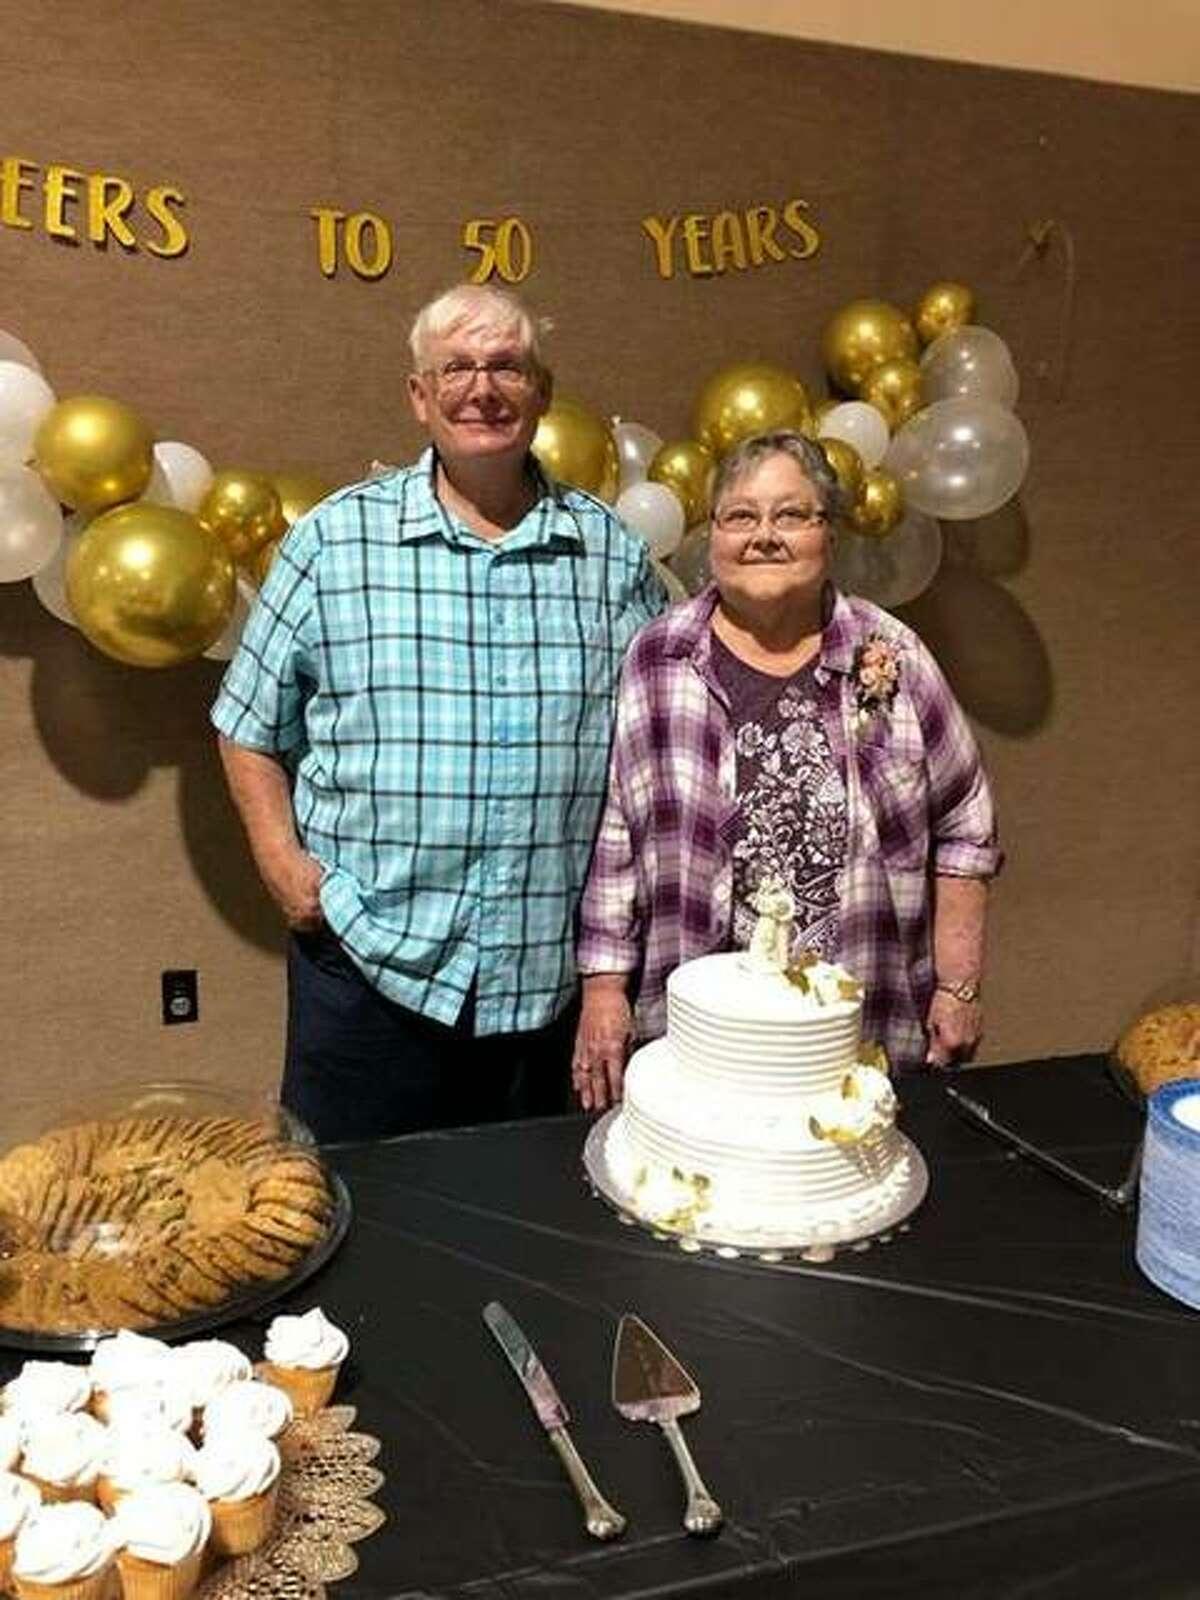 Lee and Kathy Eagleton